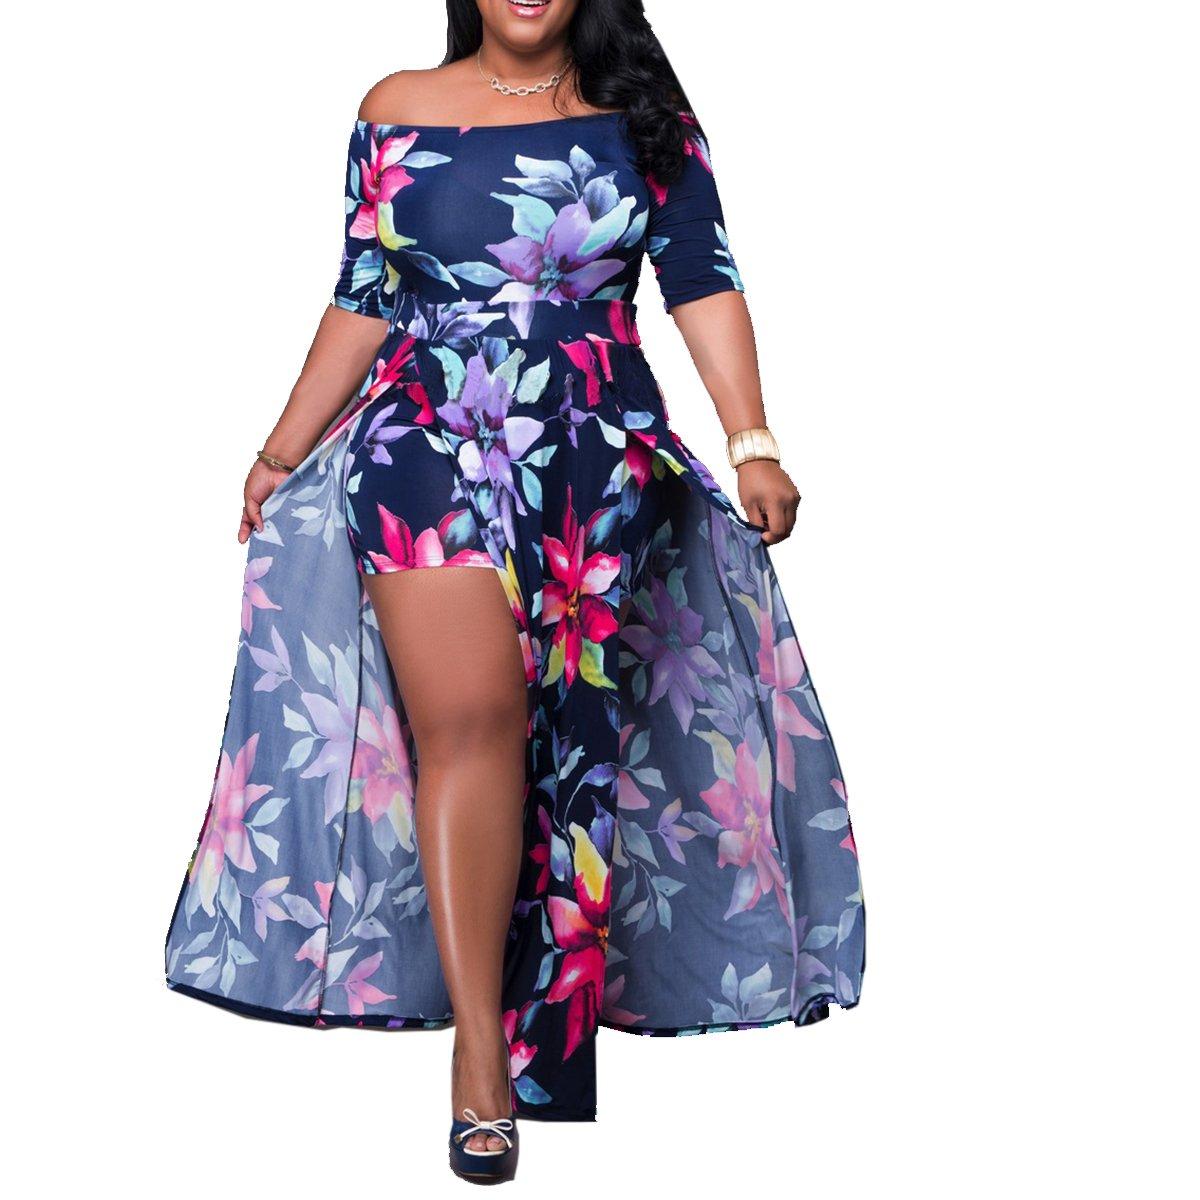 0d57ed21924 Akmipoem Women s Off Shoulder Floral Print High Split Beach Maxi Dress  Jumpsuit Romper at Amazon Women s Clothing store